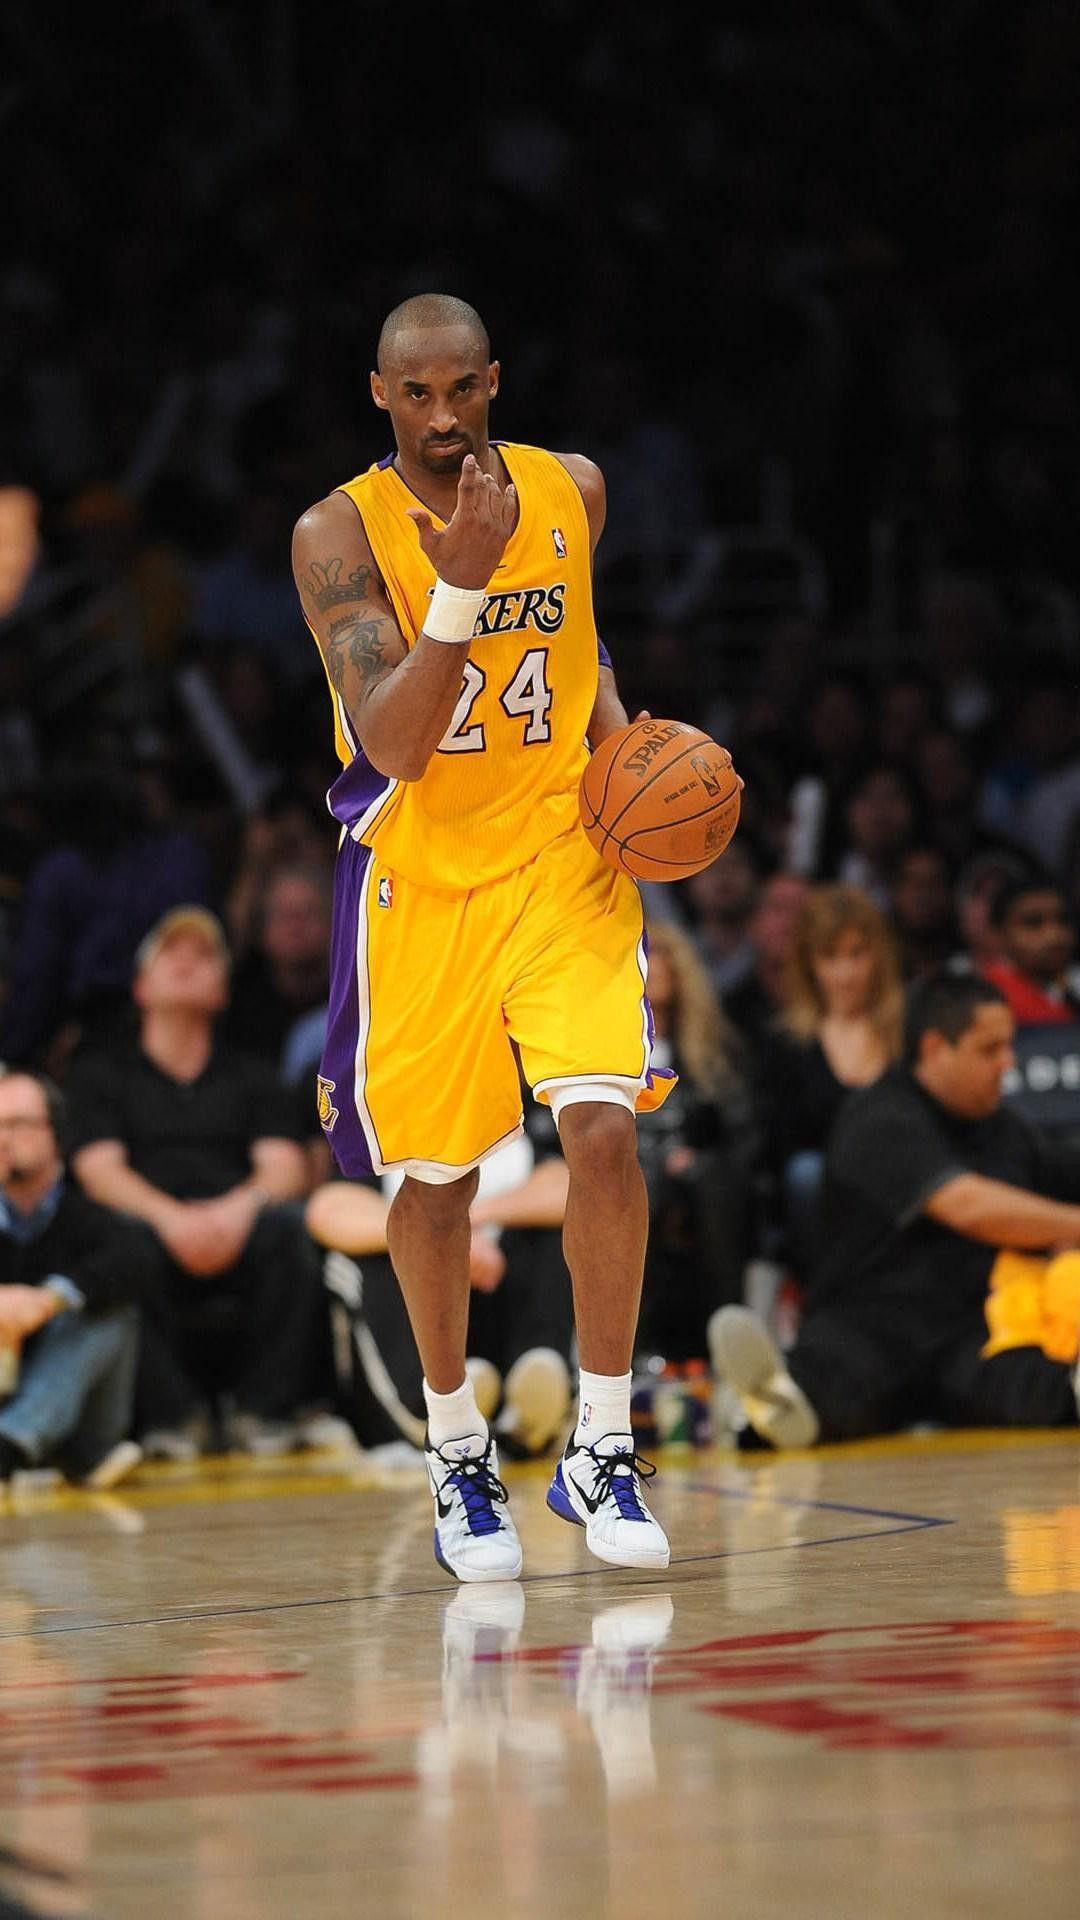 Dunk Kobe Bryant Phone Wallpaper Kobe Bryant Pictures Kobe